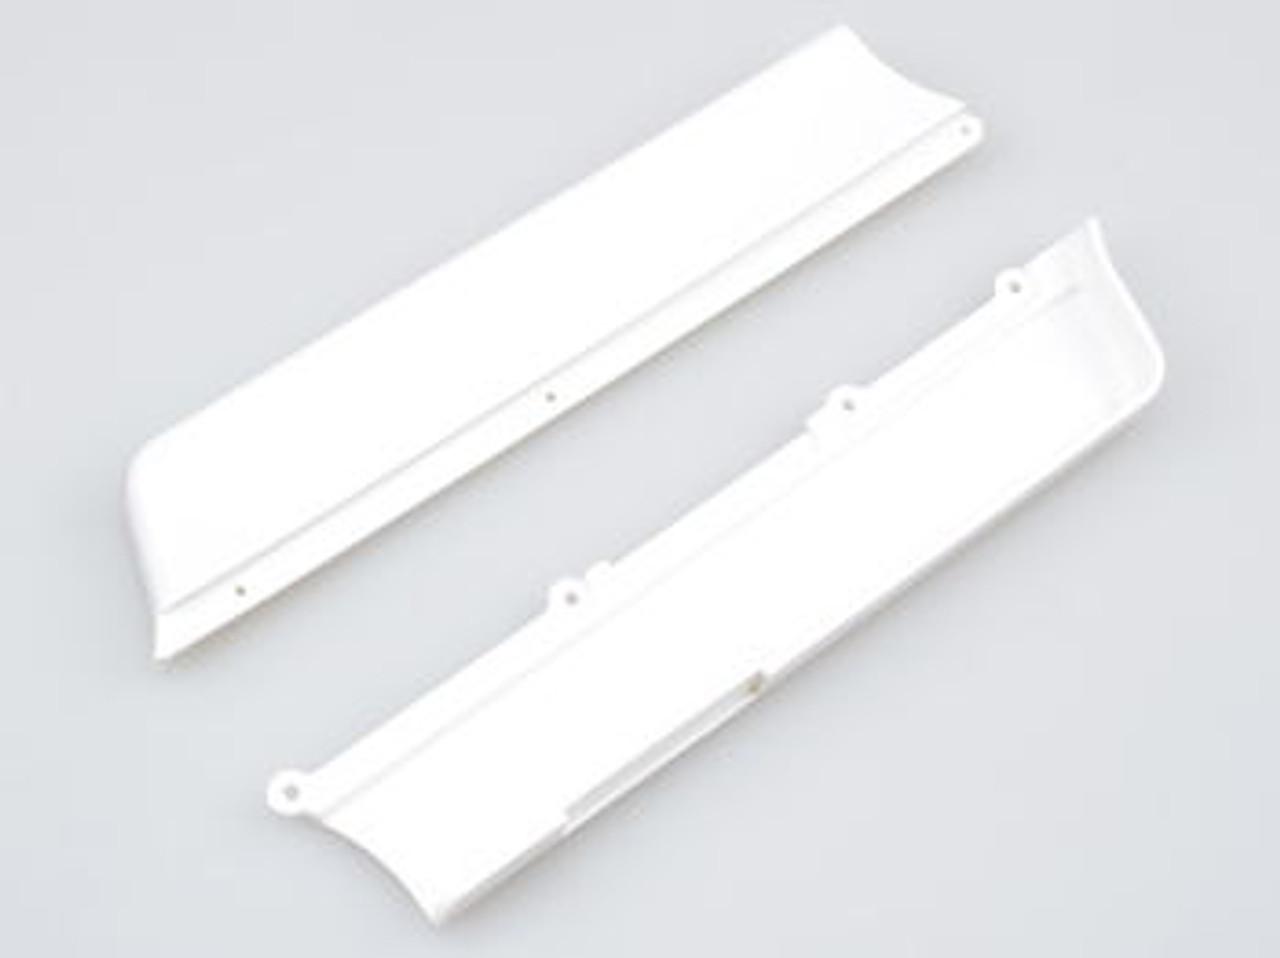 JQRacing White Sideguards (YE, WE, BE) (JQB0271LE)